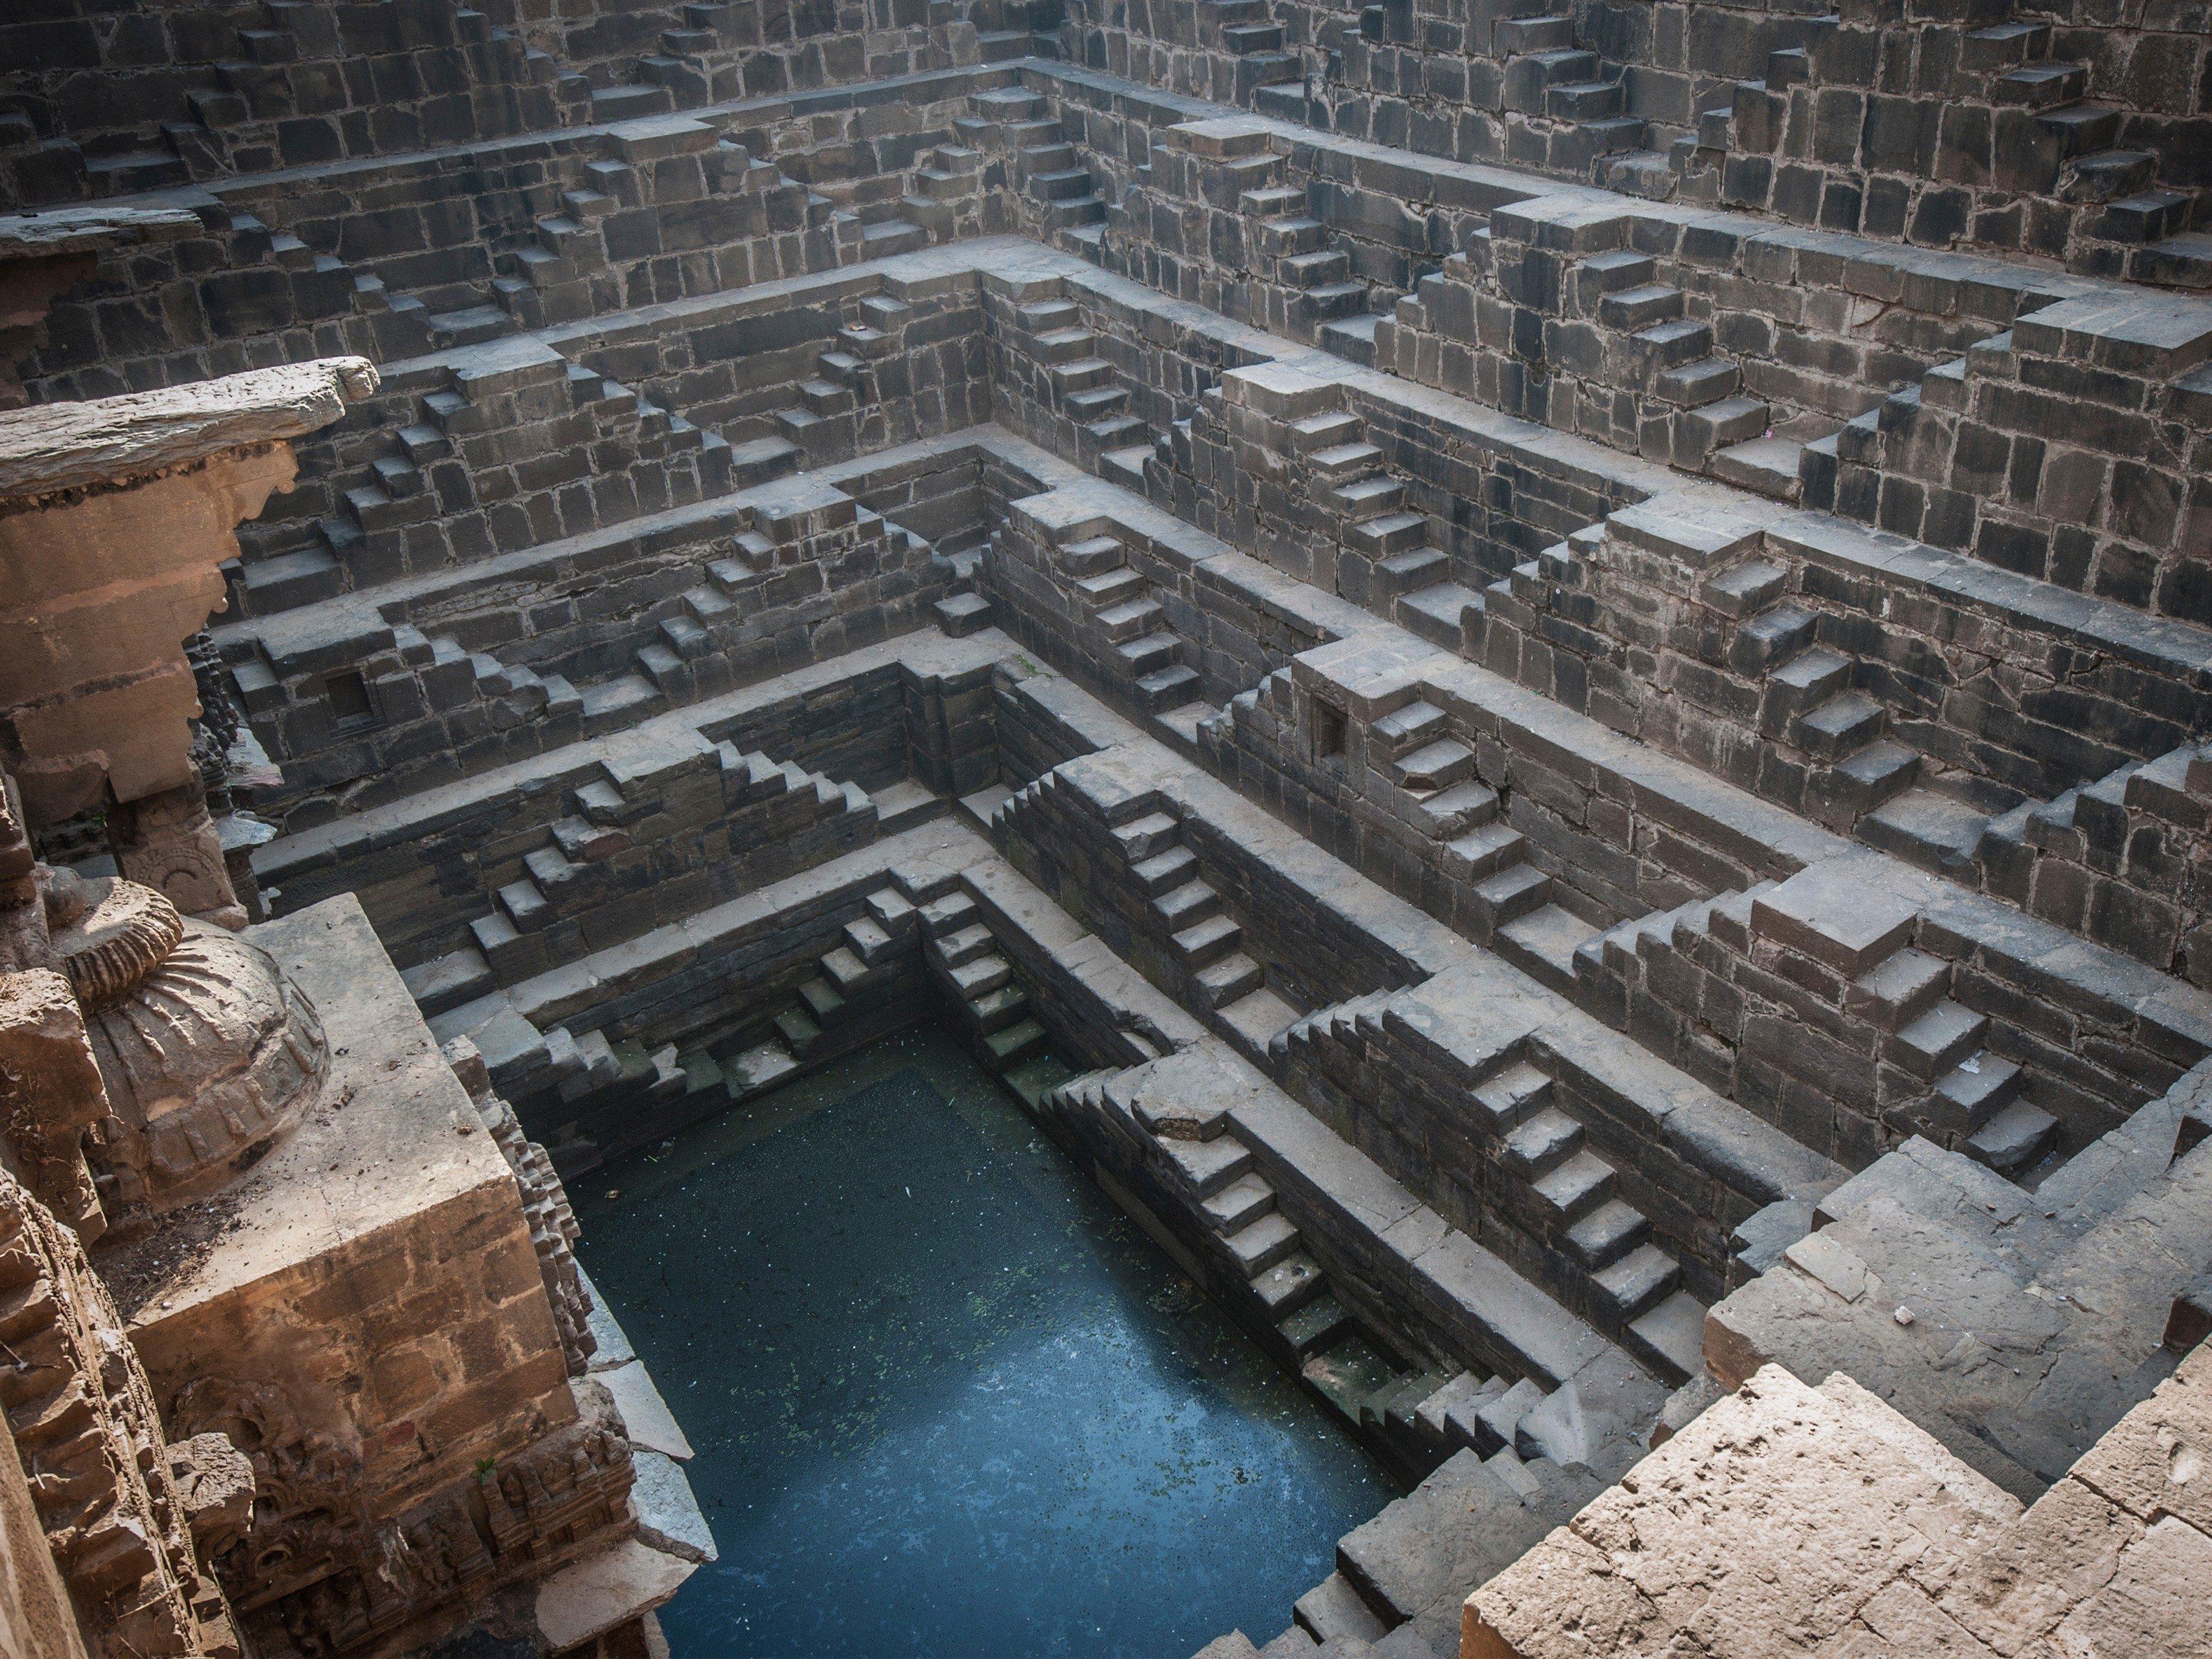 Ancient Building Feats: AchitChand Baori - India